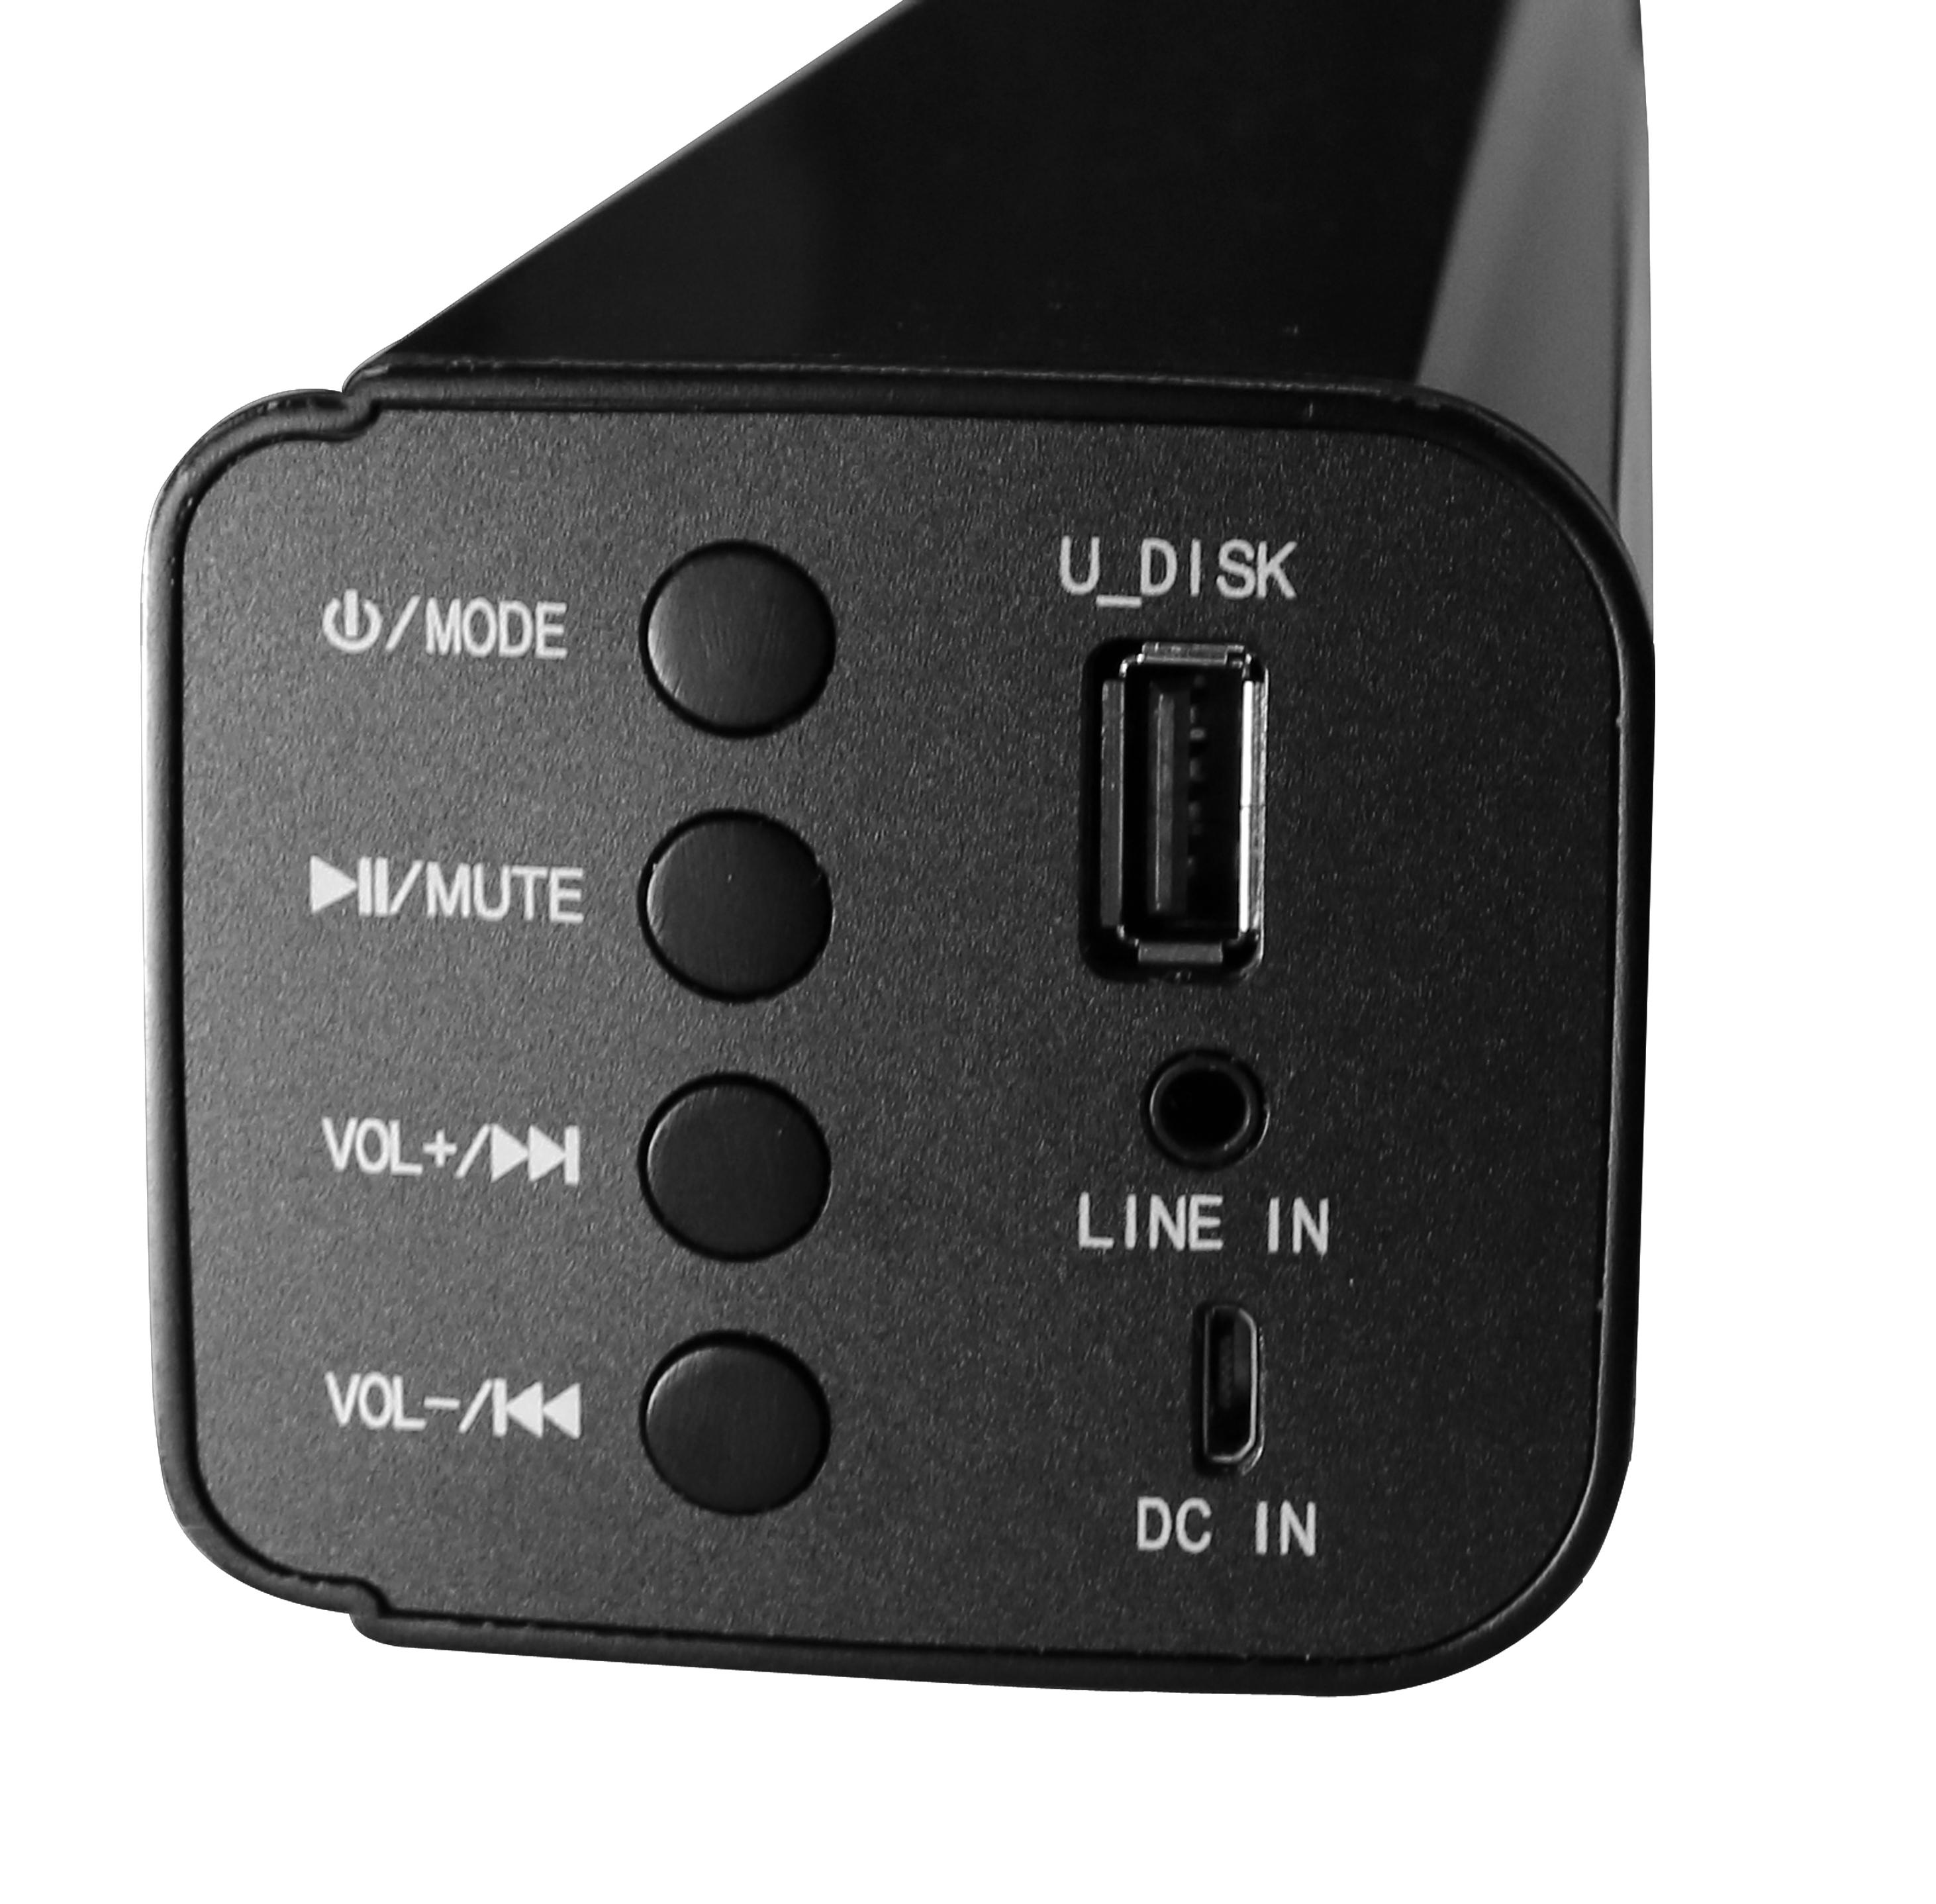 Bluetooth soudnbar-2.0